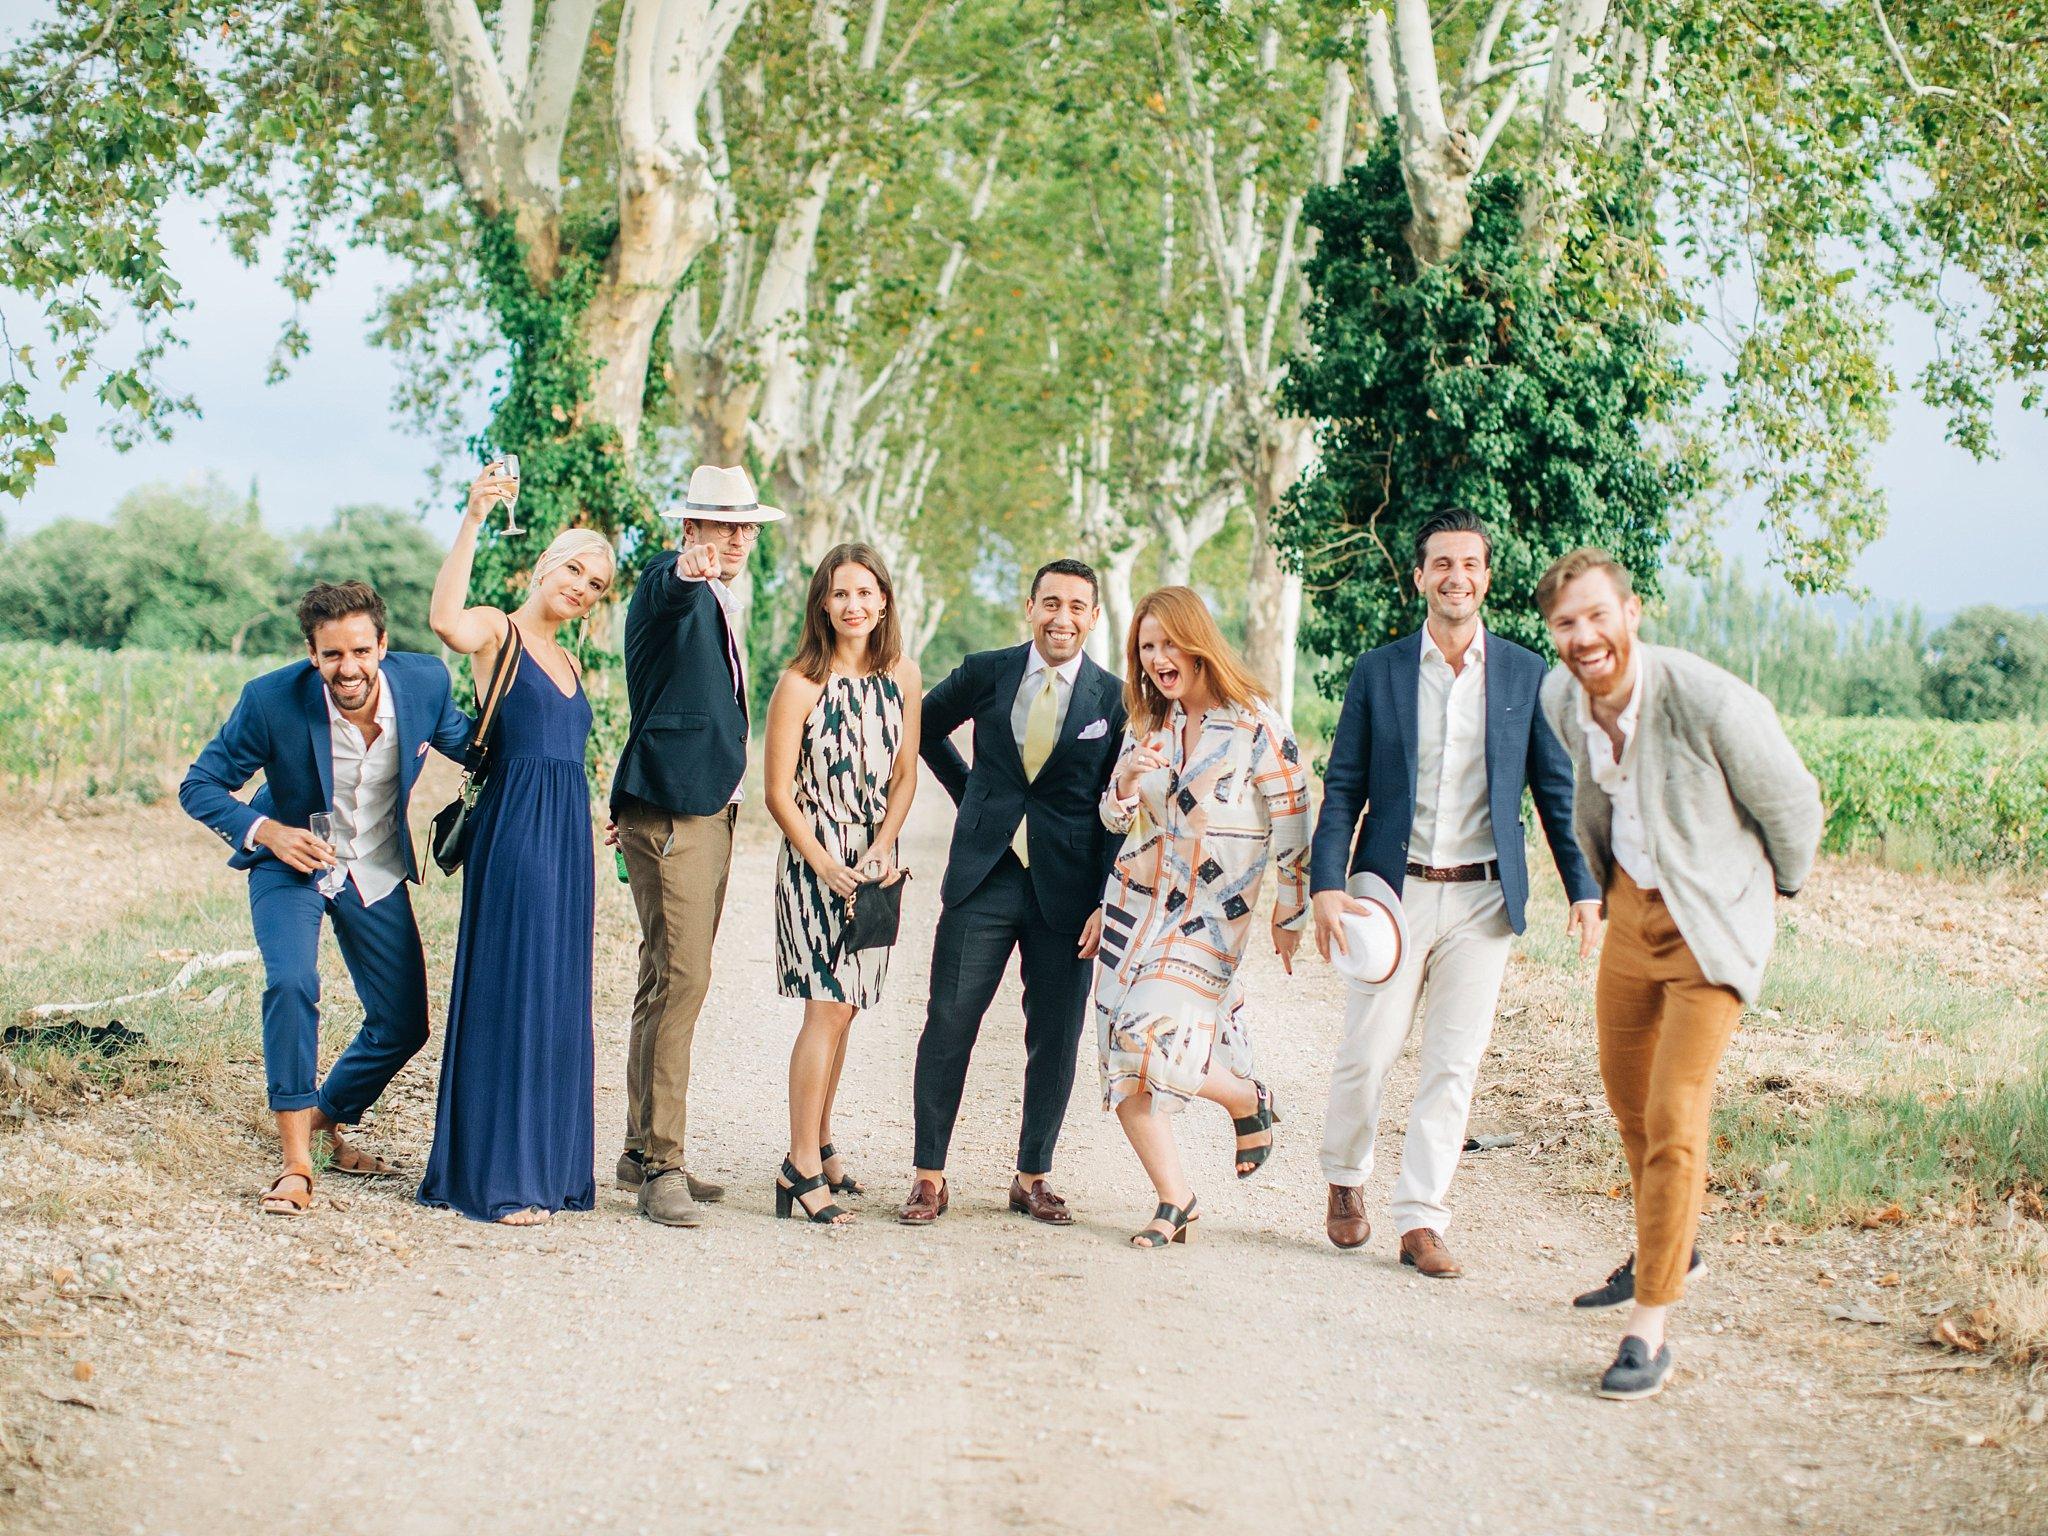 Wedding Photographer Perpignan - Château Las Collas Wedding - Hugo Hennequin085.jpg